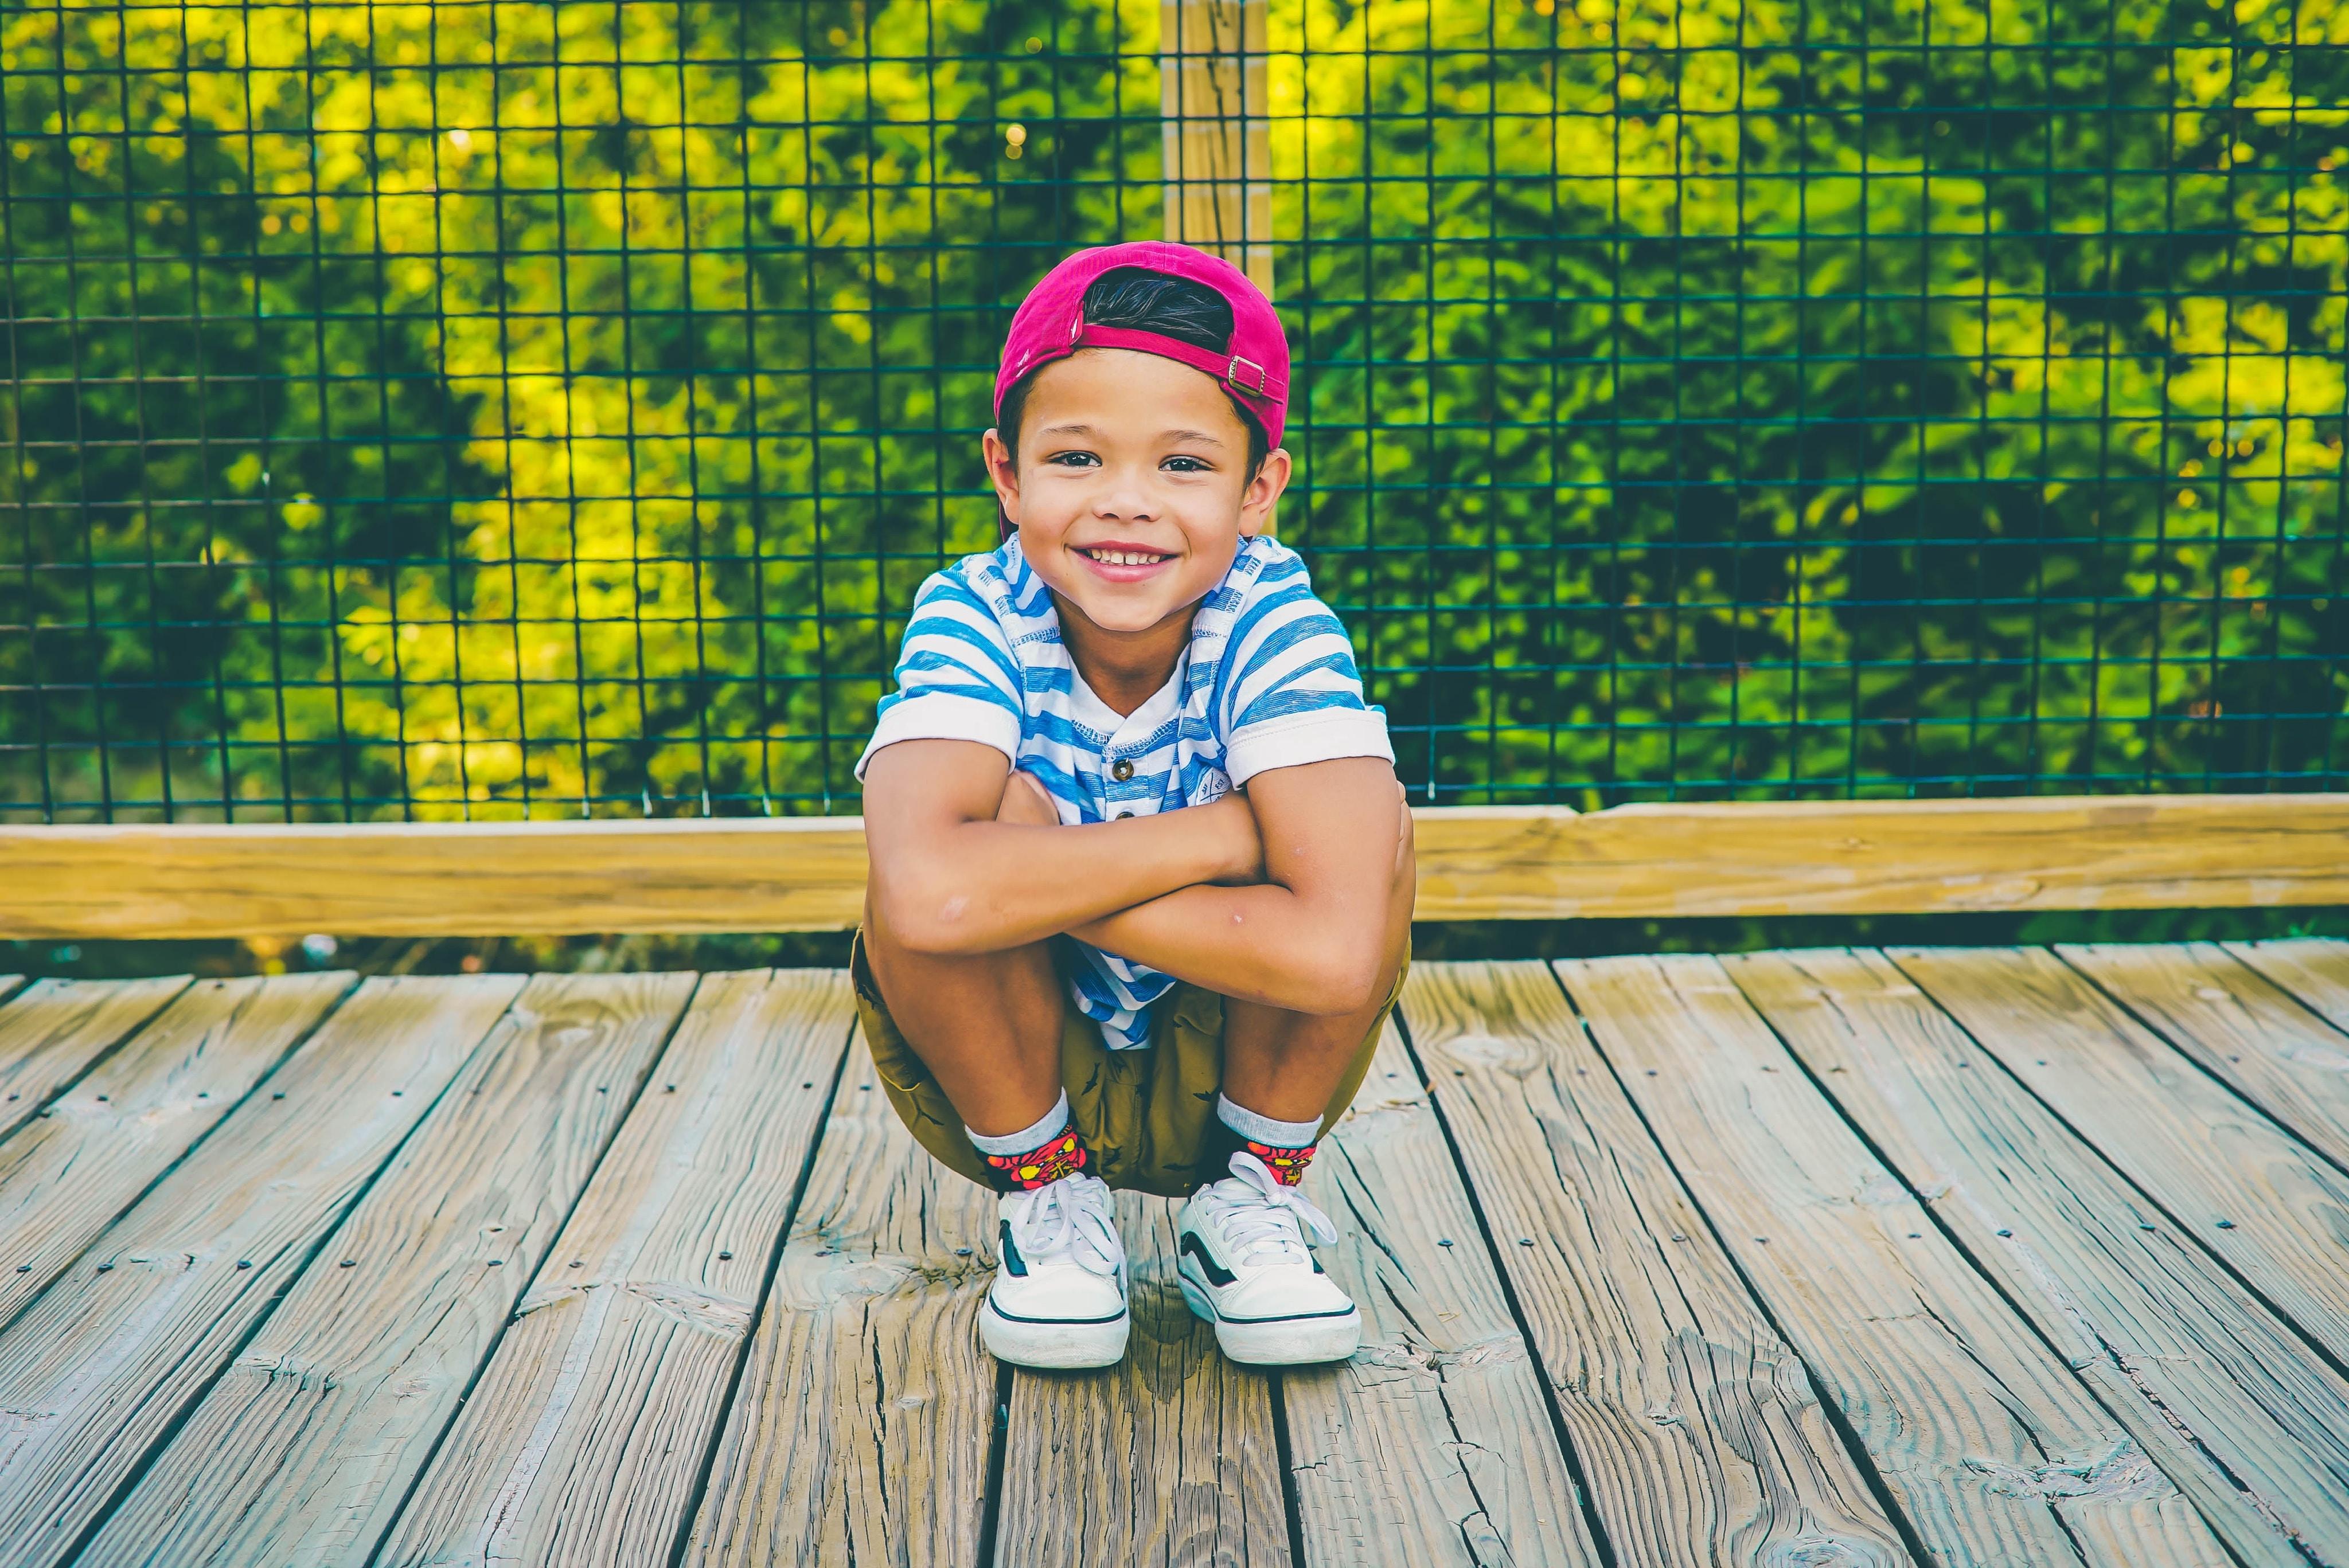 squat pink hat smile